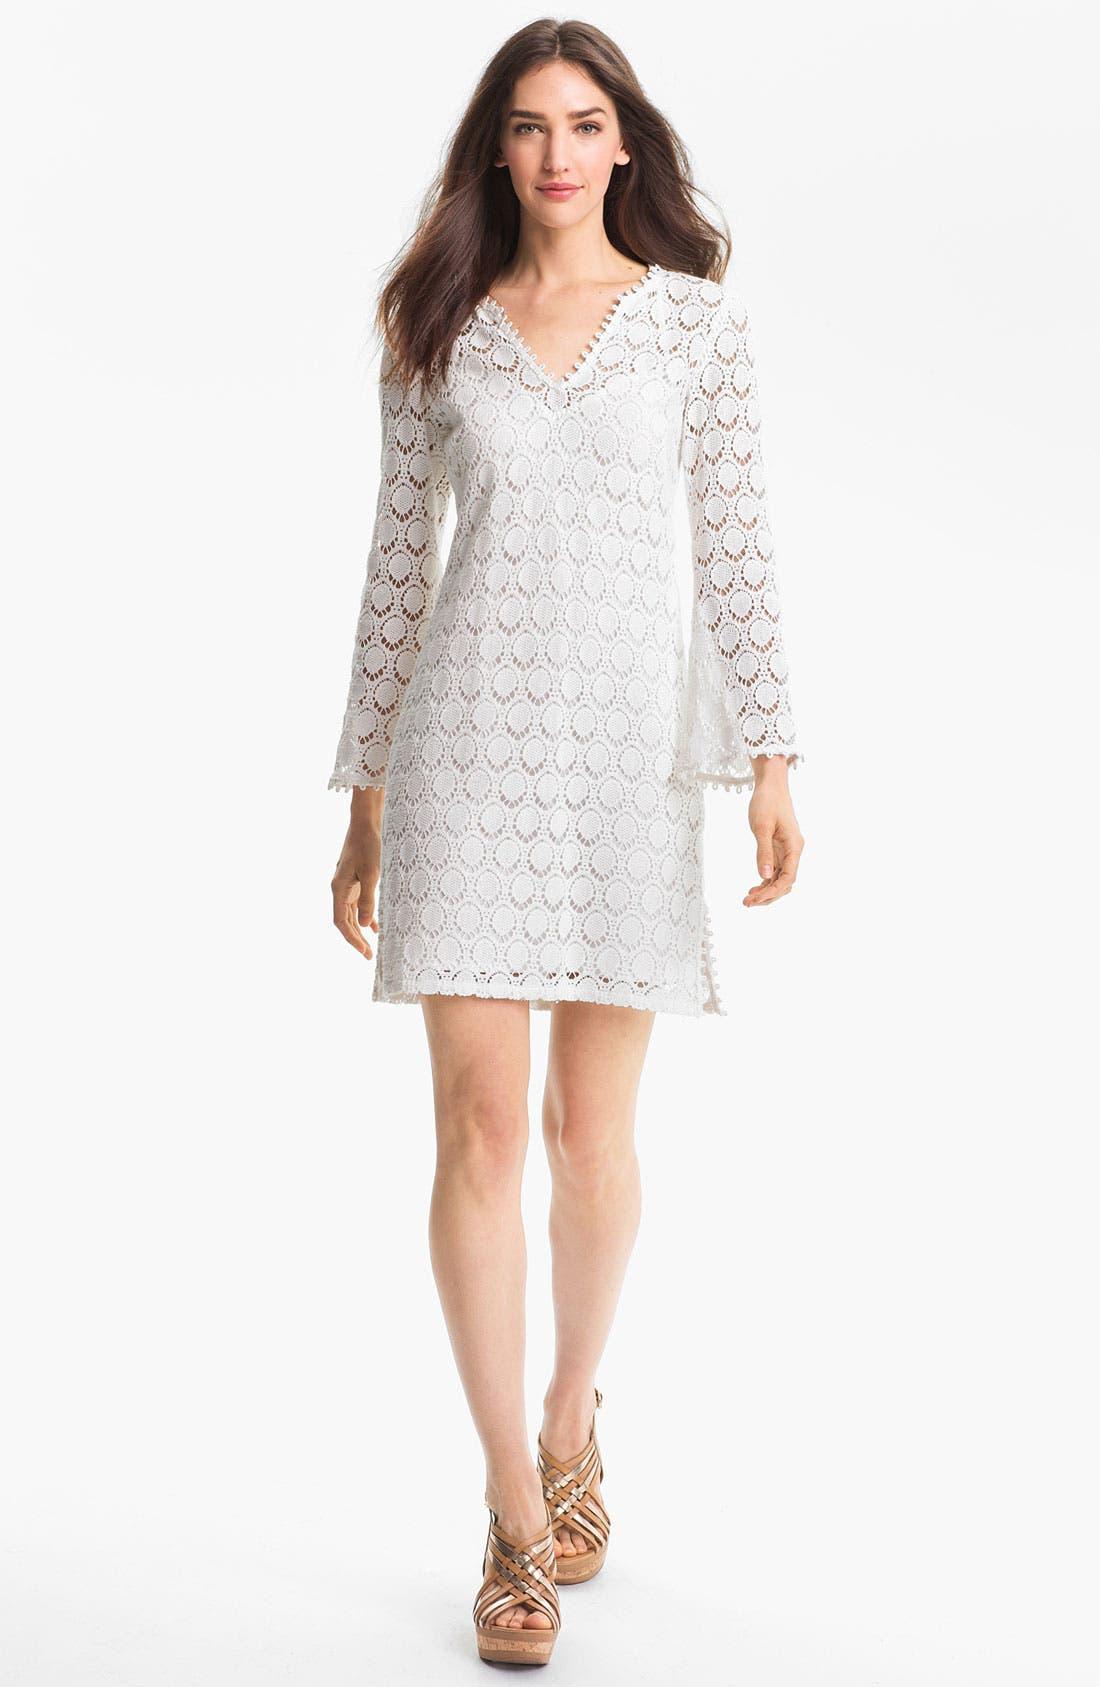 Alternate Image 1 Selected - Trina Turk 'Deep Sea' Lace Cotton Shift Dress